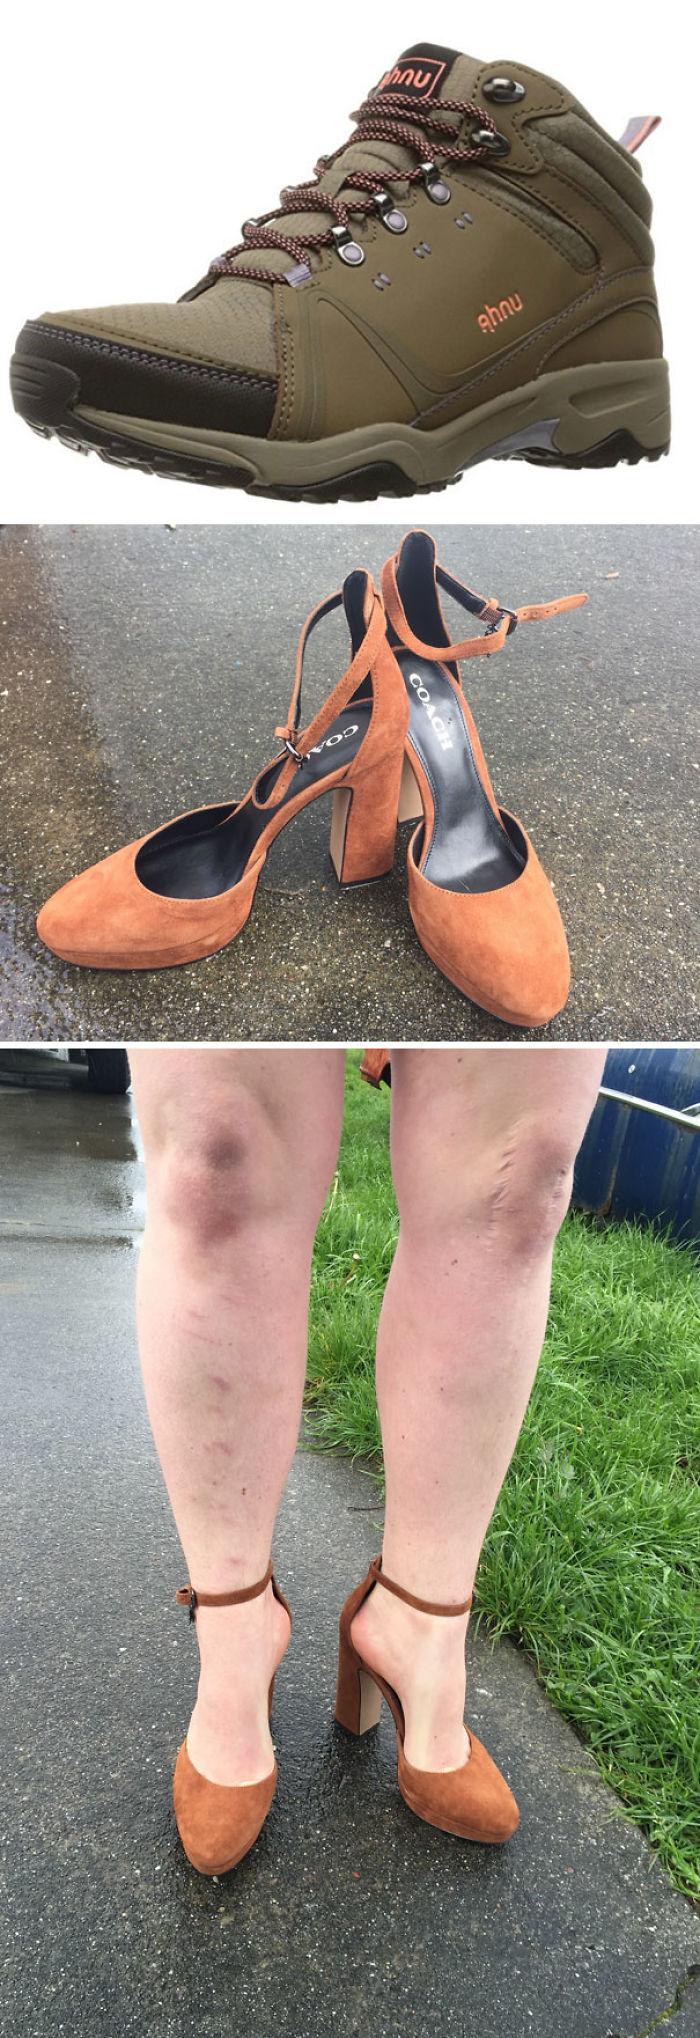 No se parece a las botas de senderismo que encargué...